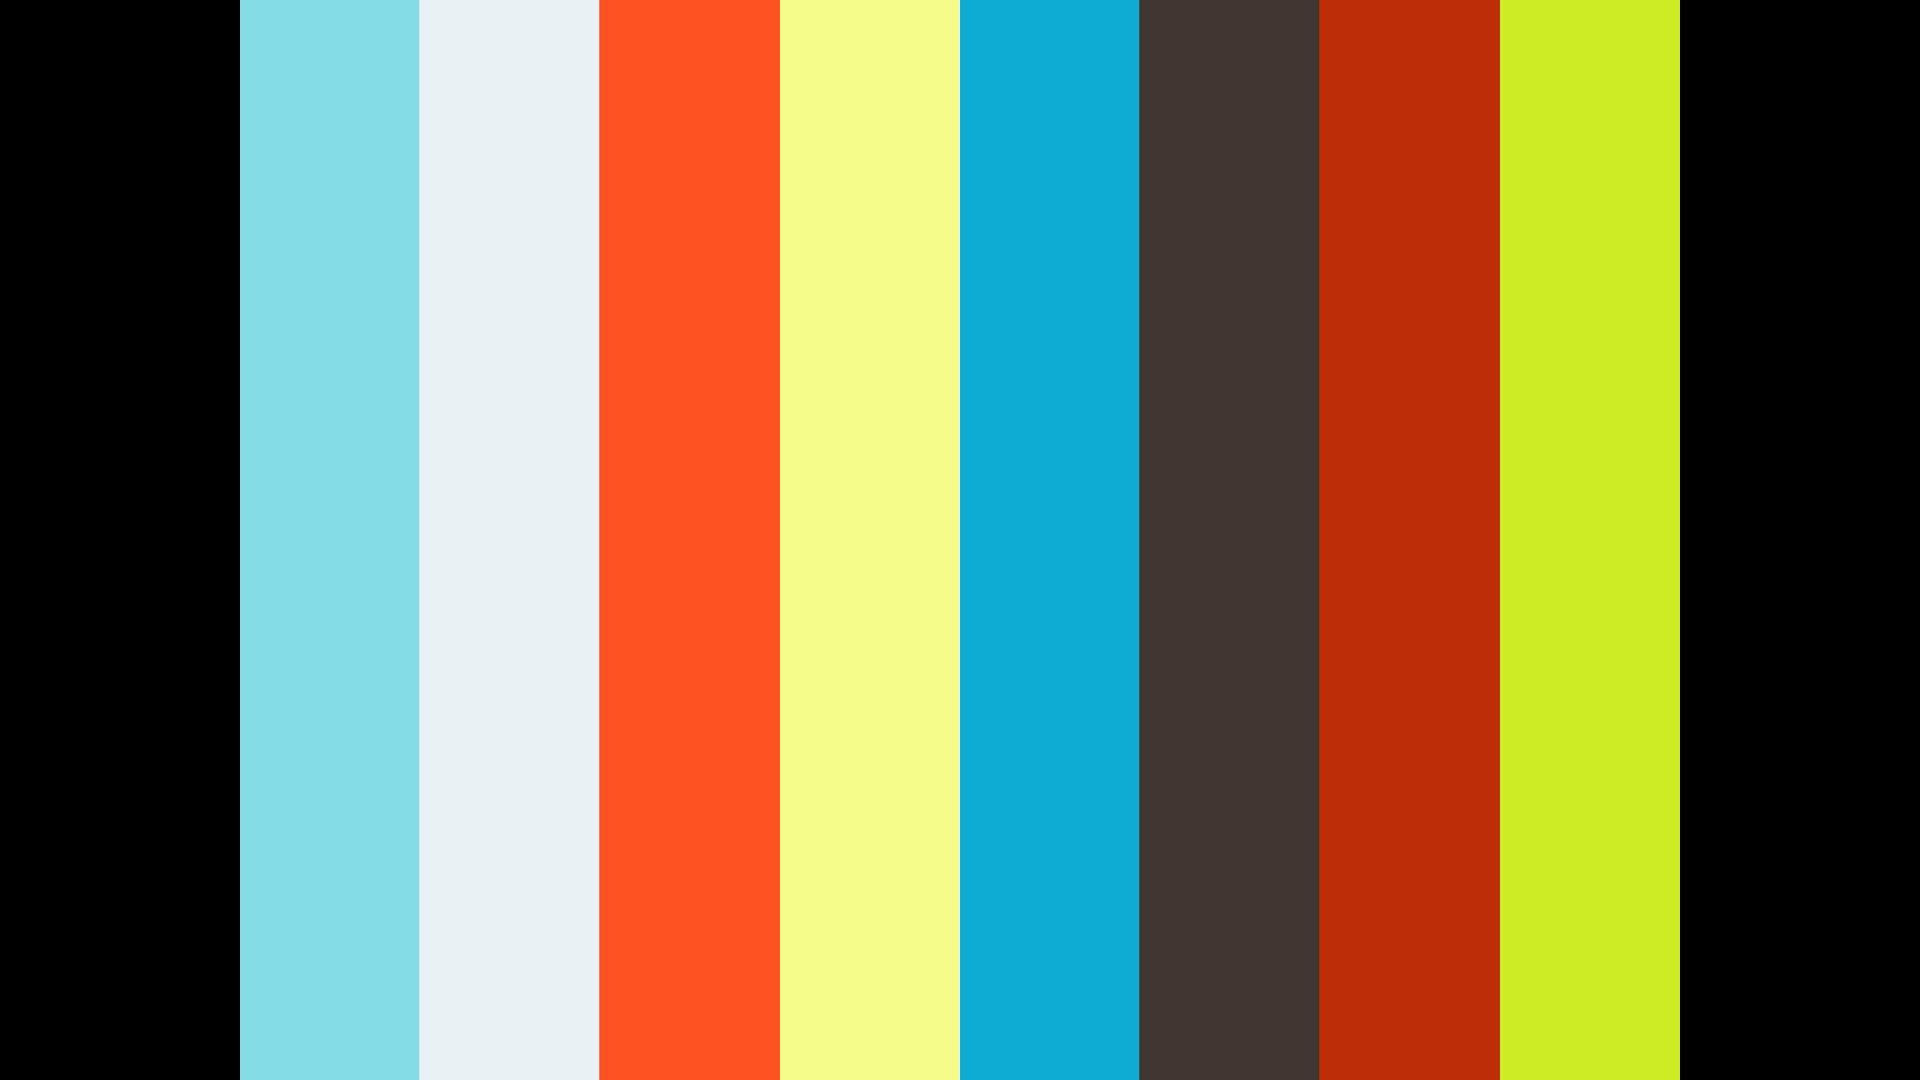 "<img class=""aligncenter"" src=""https://scwfit.com/wp-content/uploads/2017/03/maniavid.jpg"" alt="""" width=""428"" />"